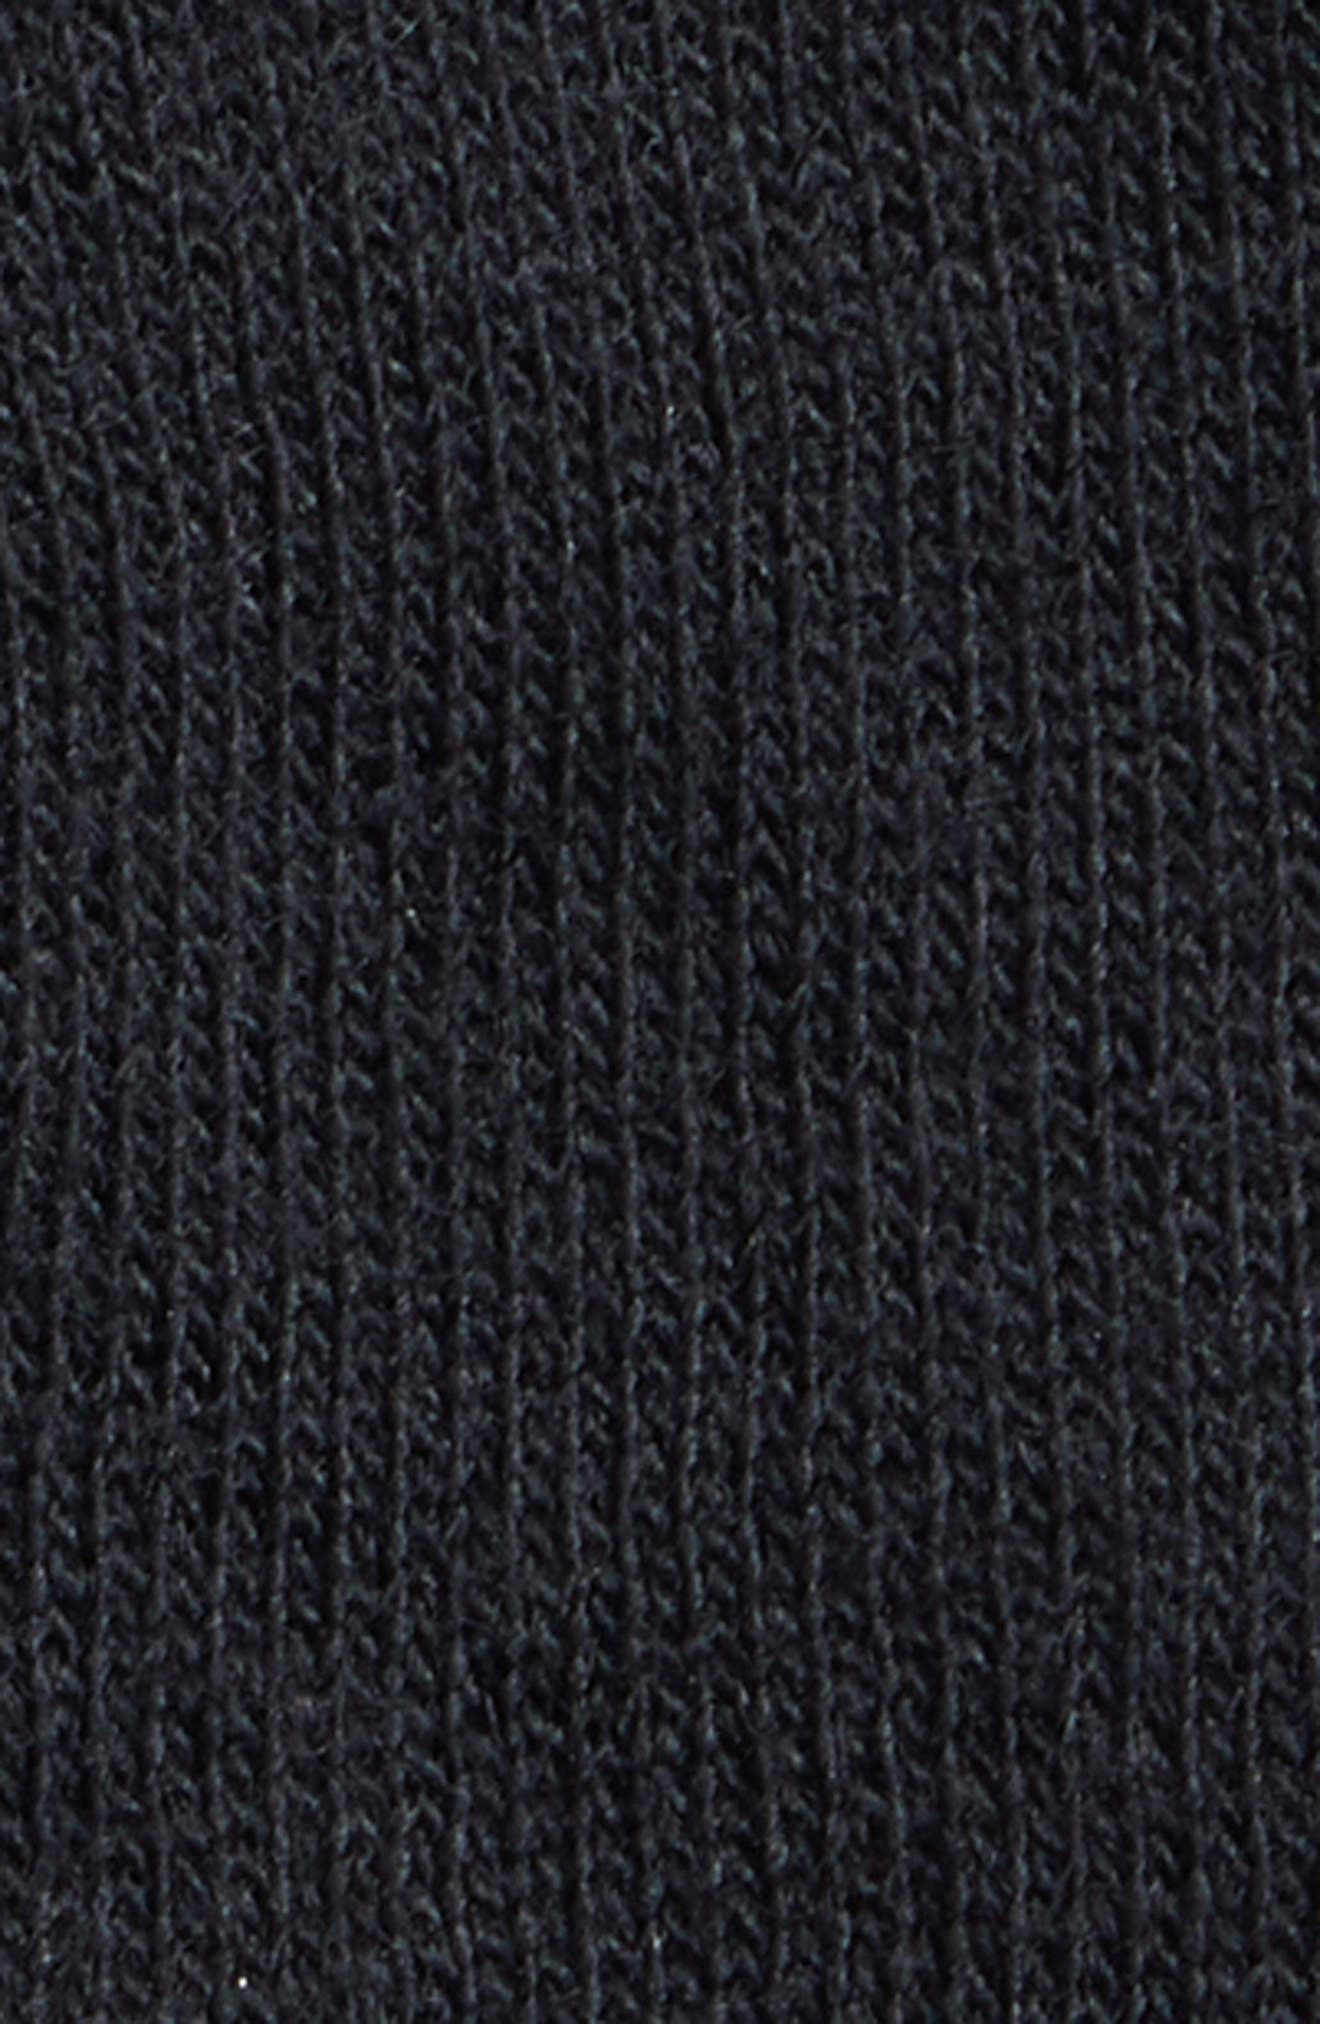 400 Beanie,                             Alternate thumbnail 4, color,                             BLACK